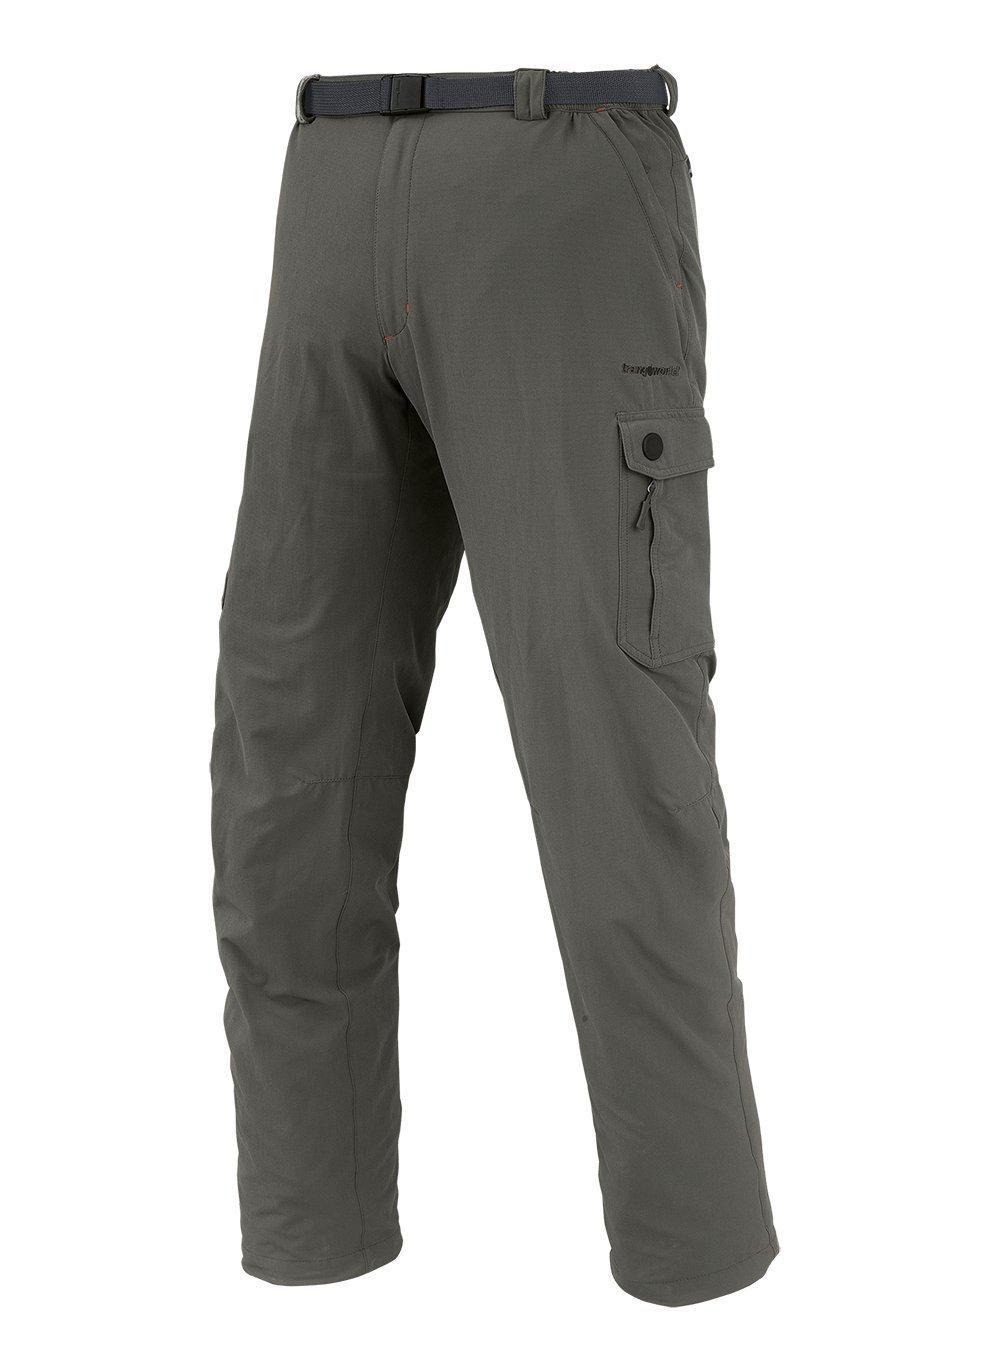 Kaki XL Trangoworld Murren Pantalon Long, Homme